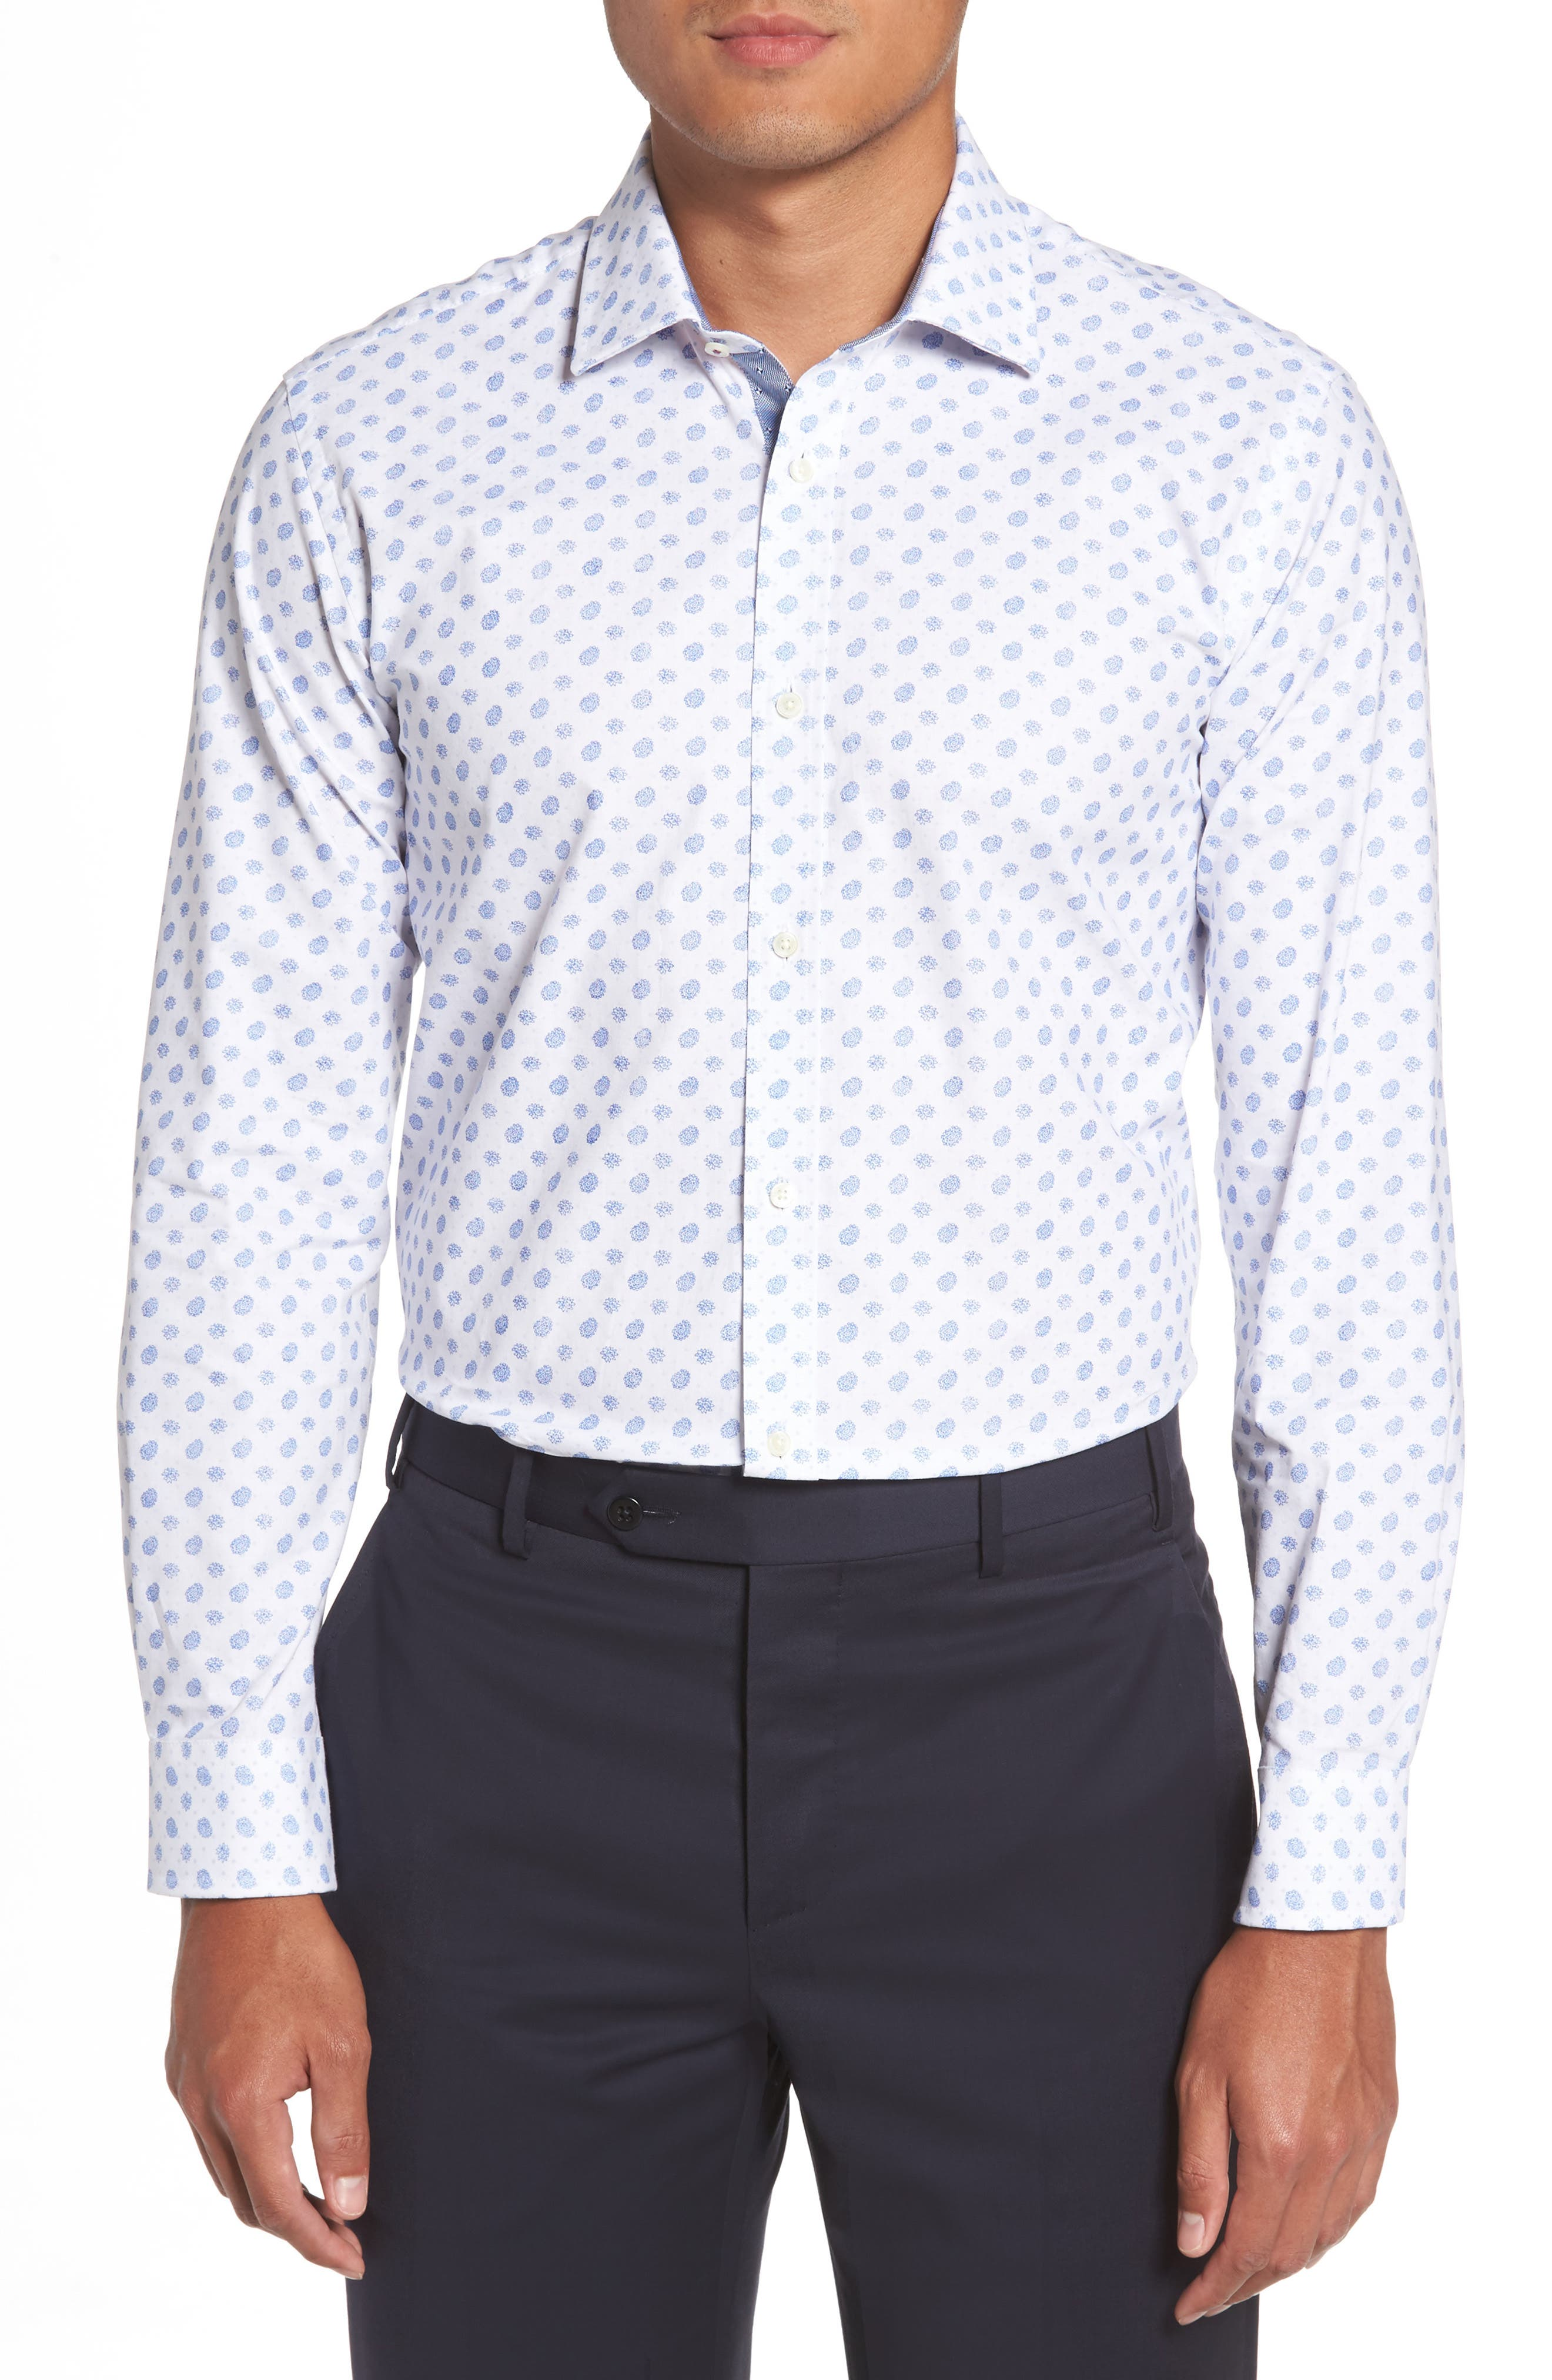 Midra Trim Fit Paisley Dress Shirt,                             Main thumbnail 1, color,                             110